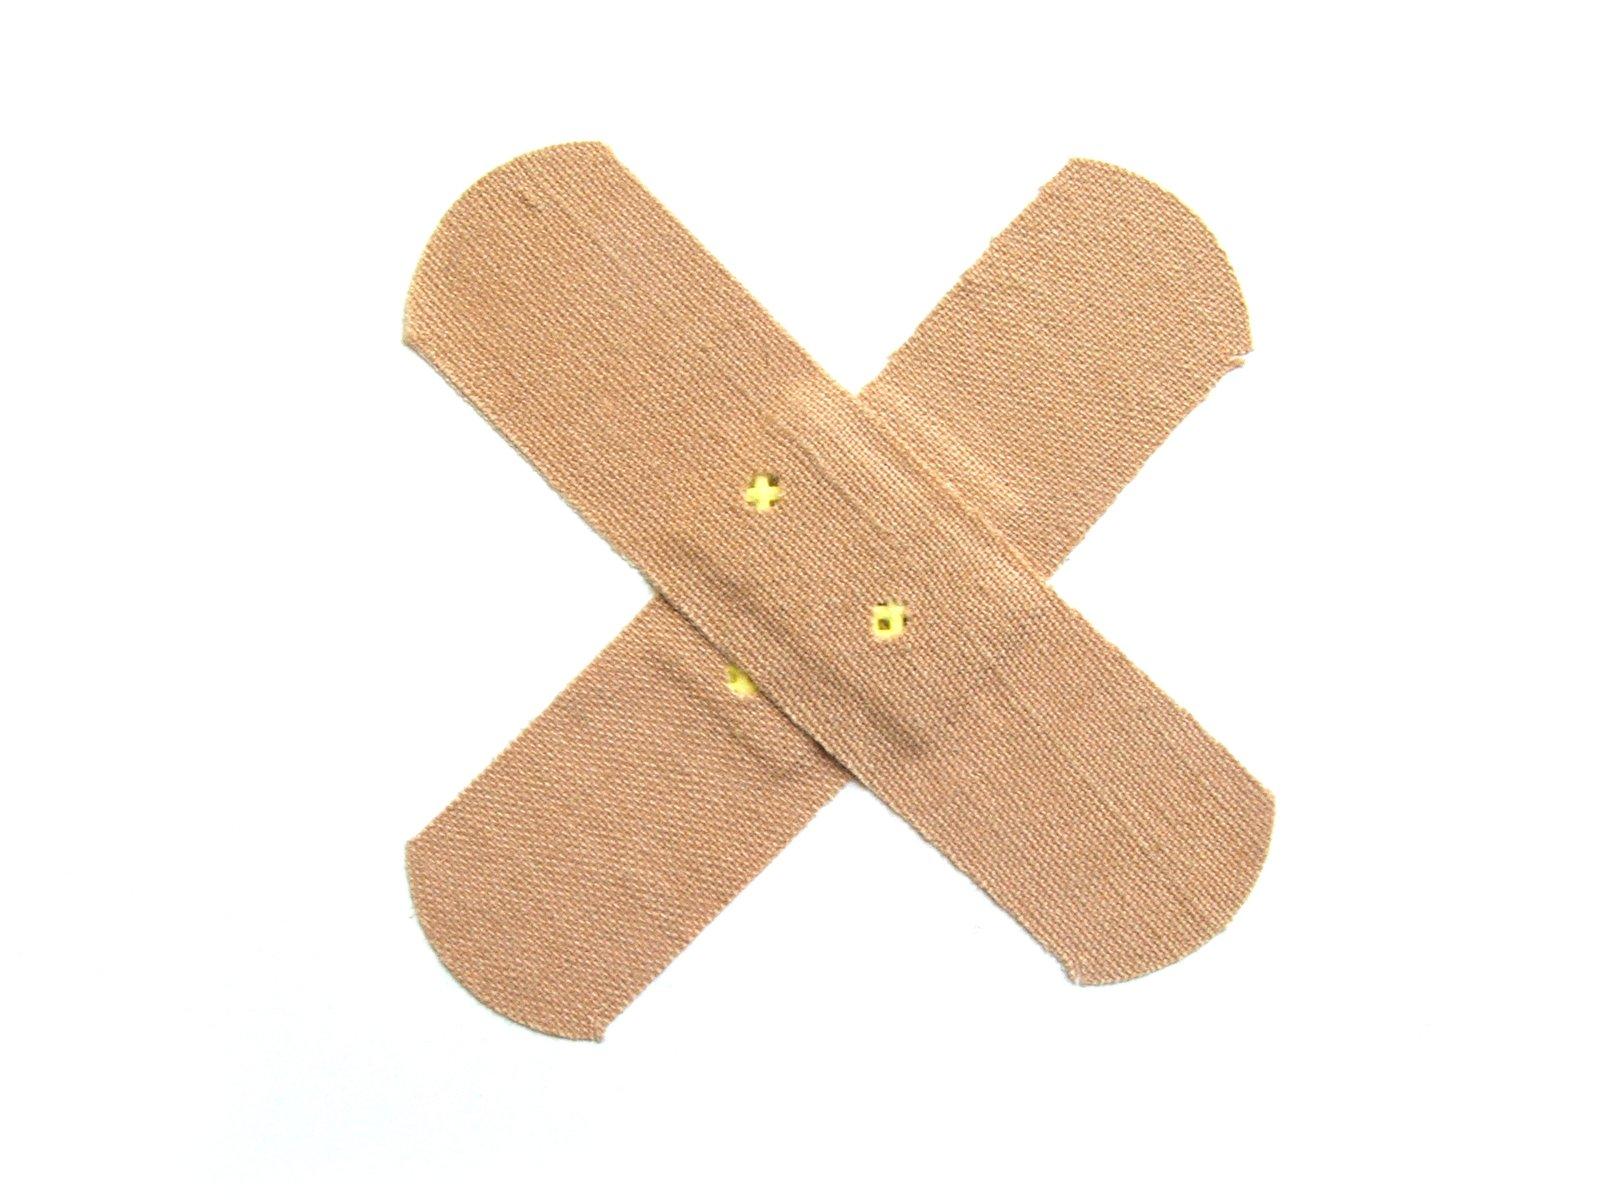 Band-aid criss cross